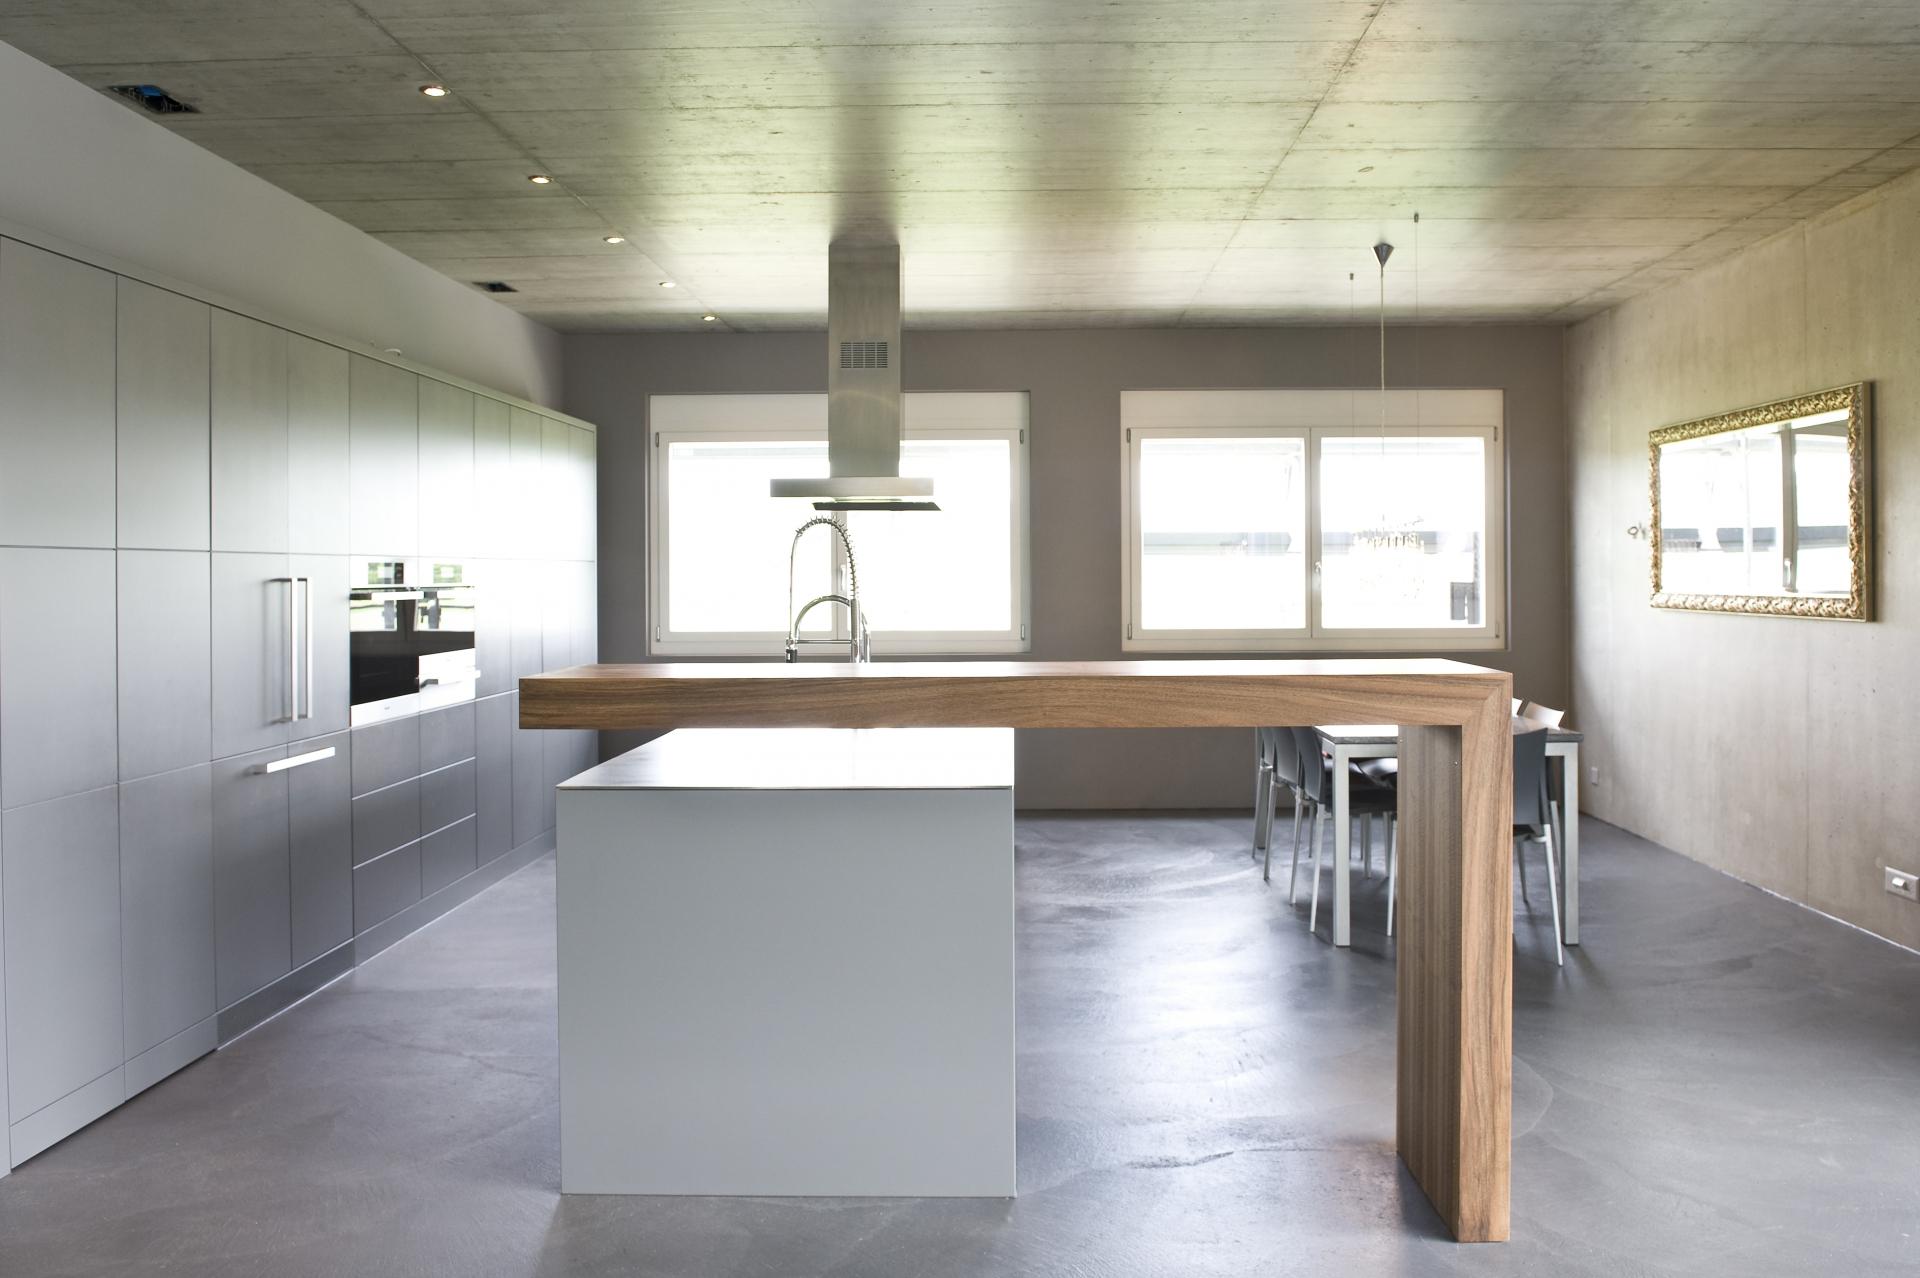 Full Size of Bilder Freistehende Küche Freistehende Küchenzeile Freistehende Spüle Küche Freistehende Küchenspüle Küche Freistehende Küche